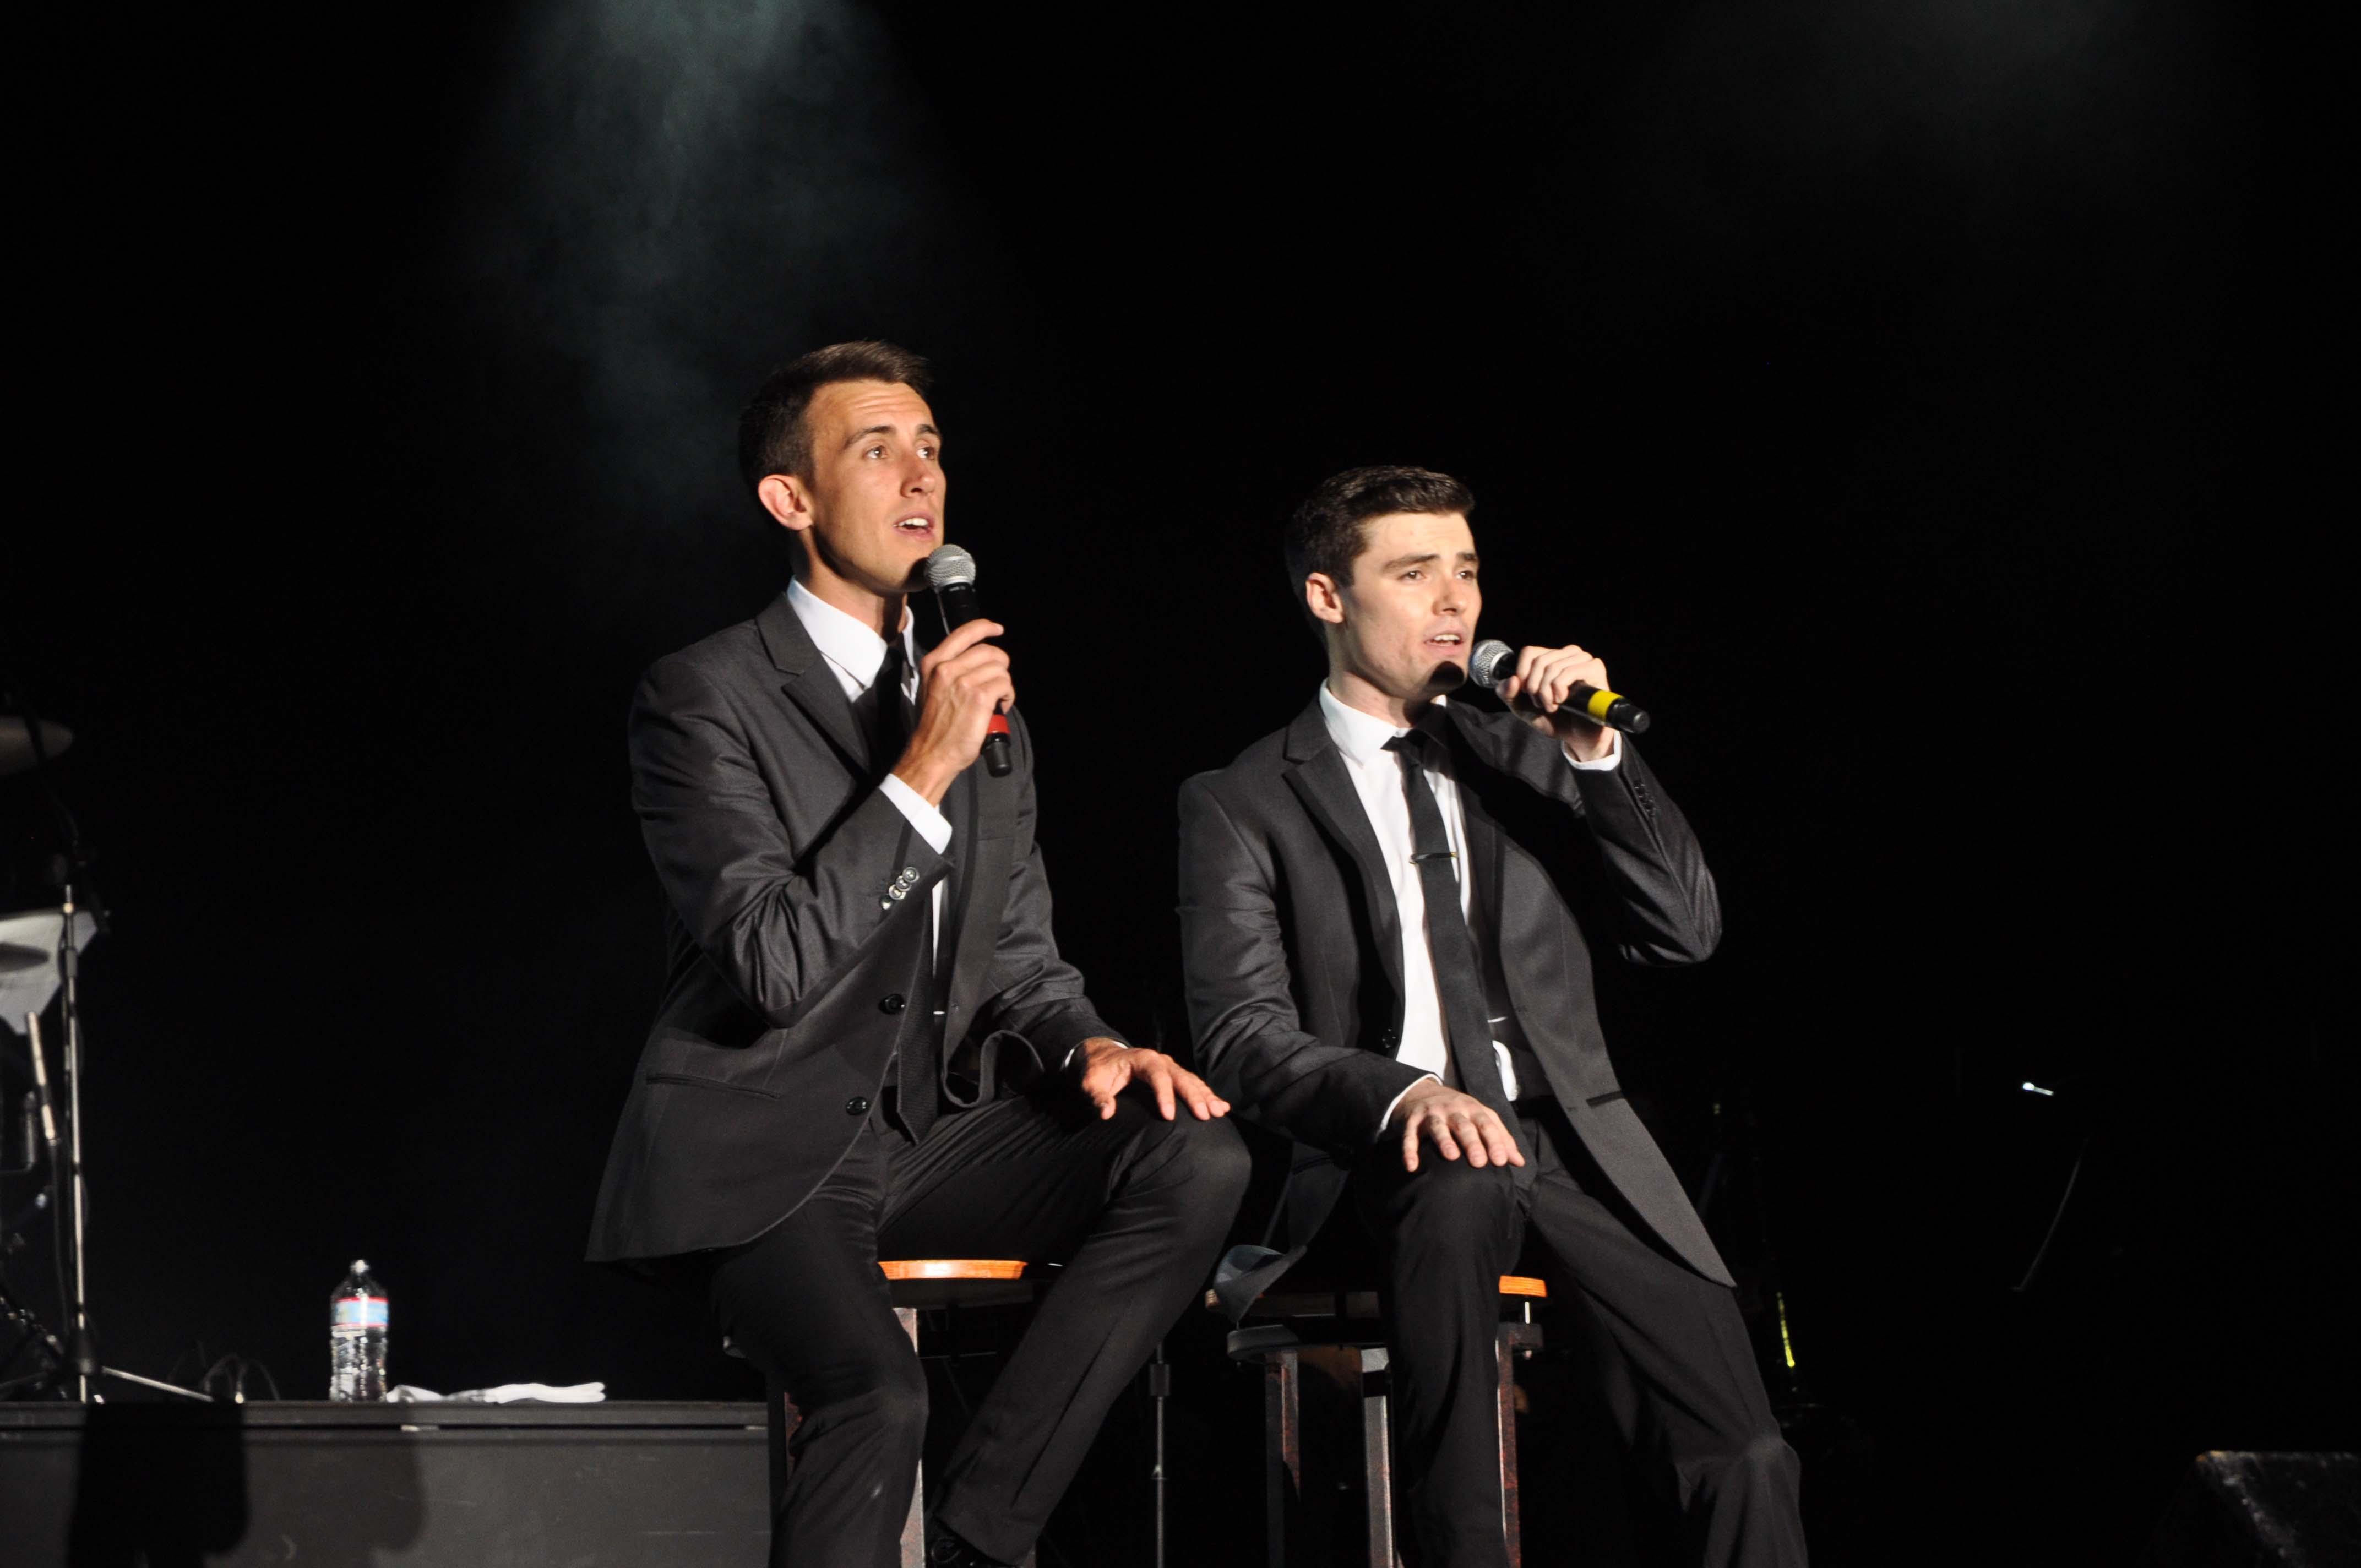 Hugh and Tom